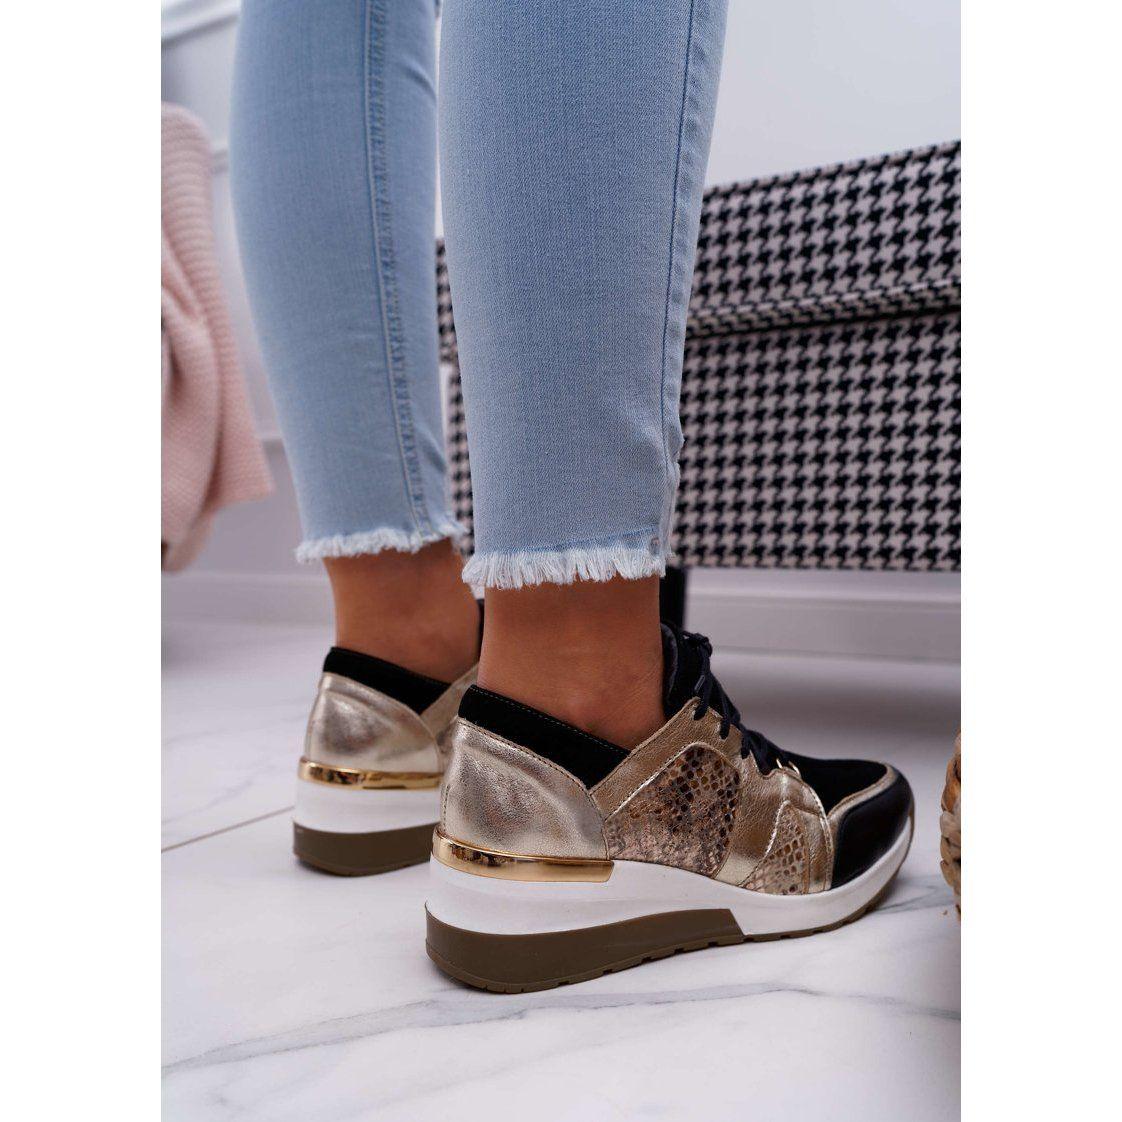 Nicole Sneakersy Damskie Zlote Skora Naturalna Coledo Zloty Shoes Espadrilles Fashion